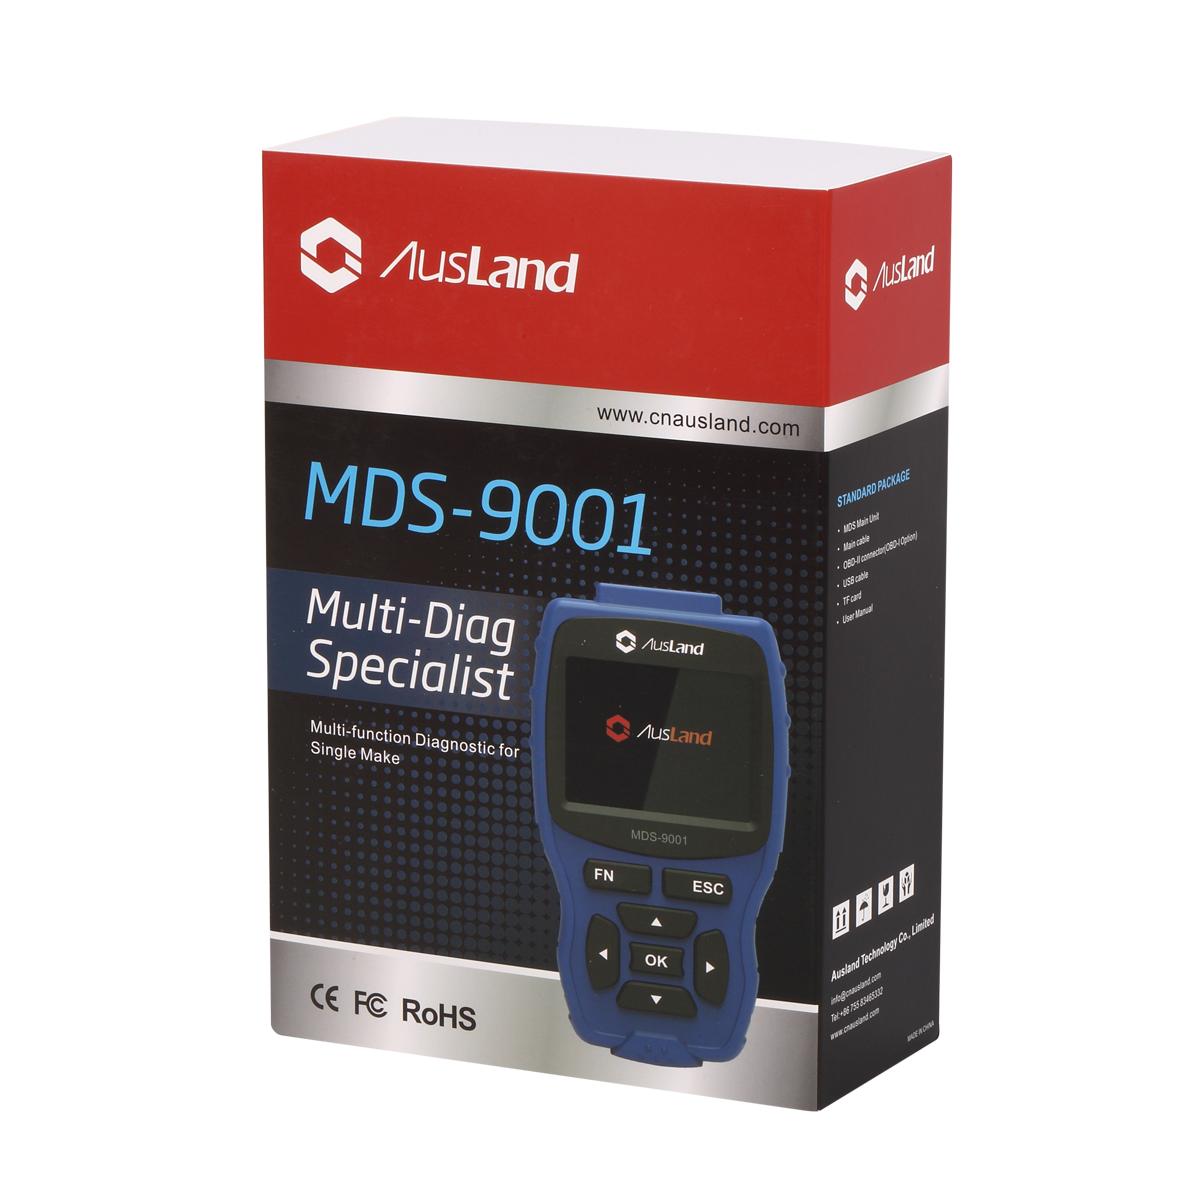 mds 9001-7